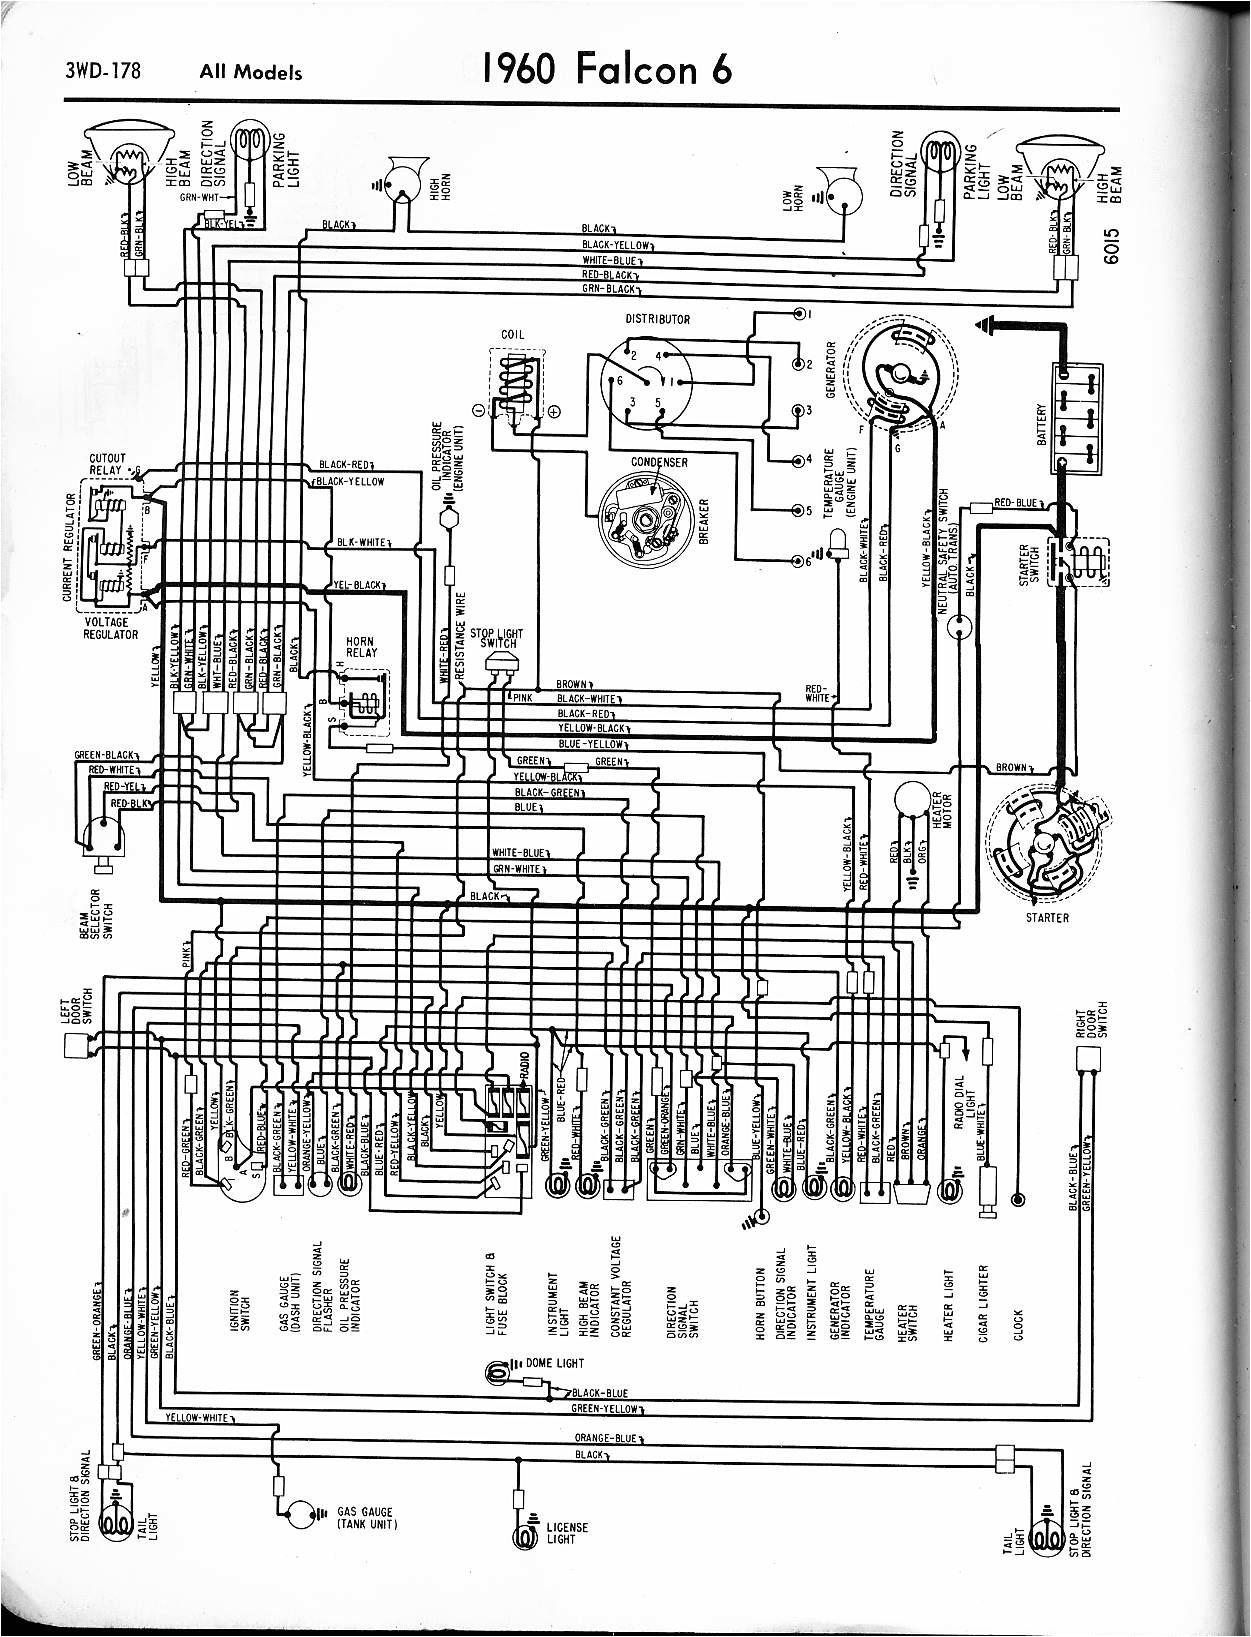 100 Watt Metal Halide Ballast Wiring Diagram 100 Watt Metal Halide Ballast Wiring Diagram